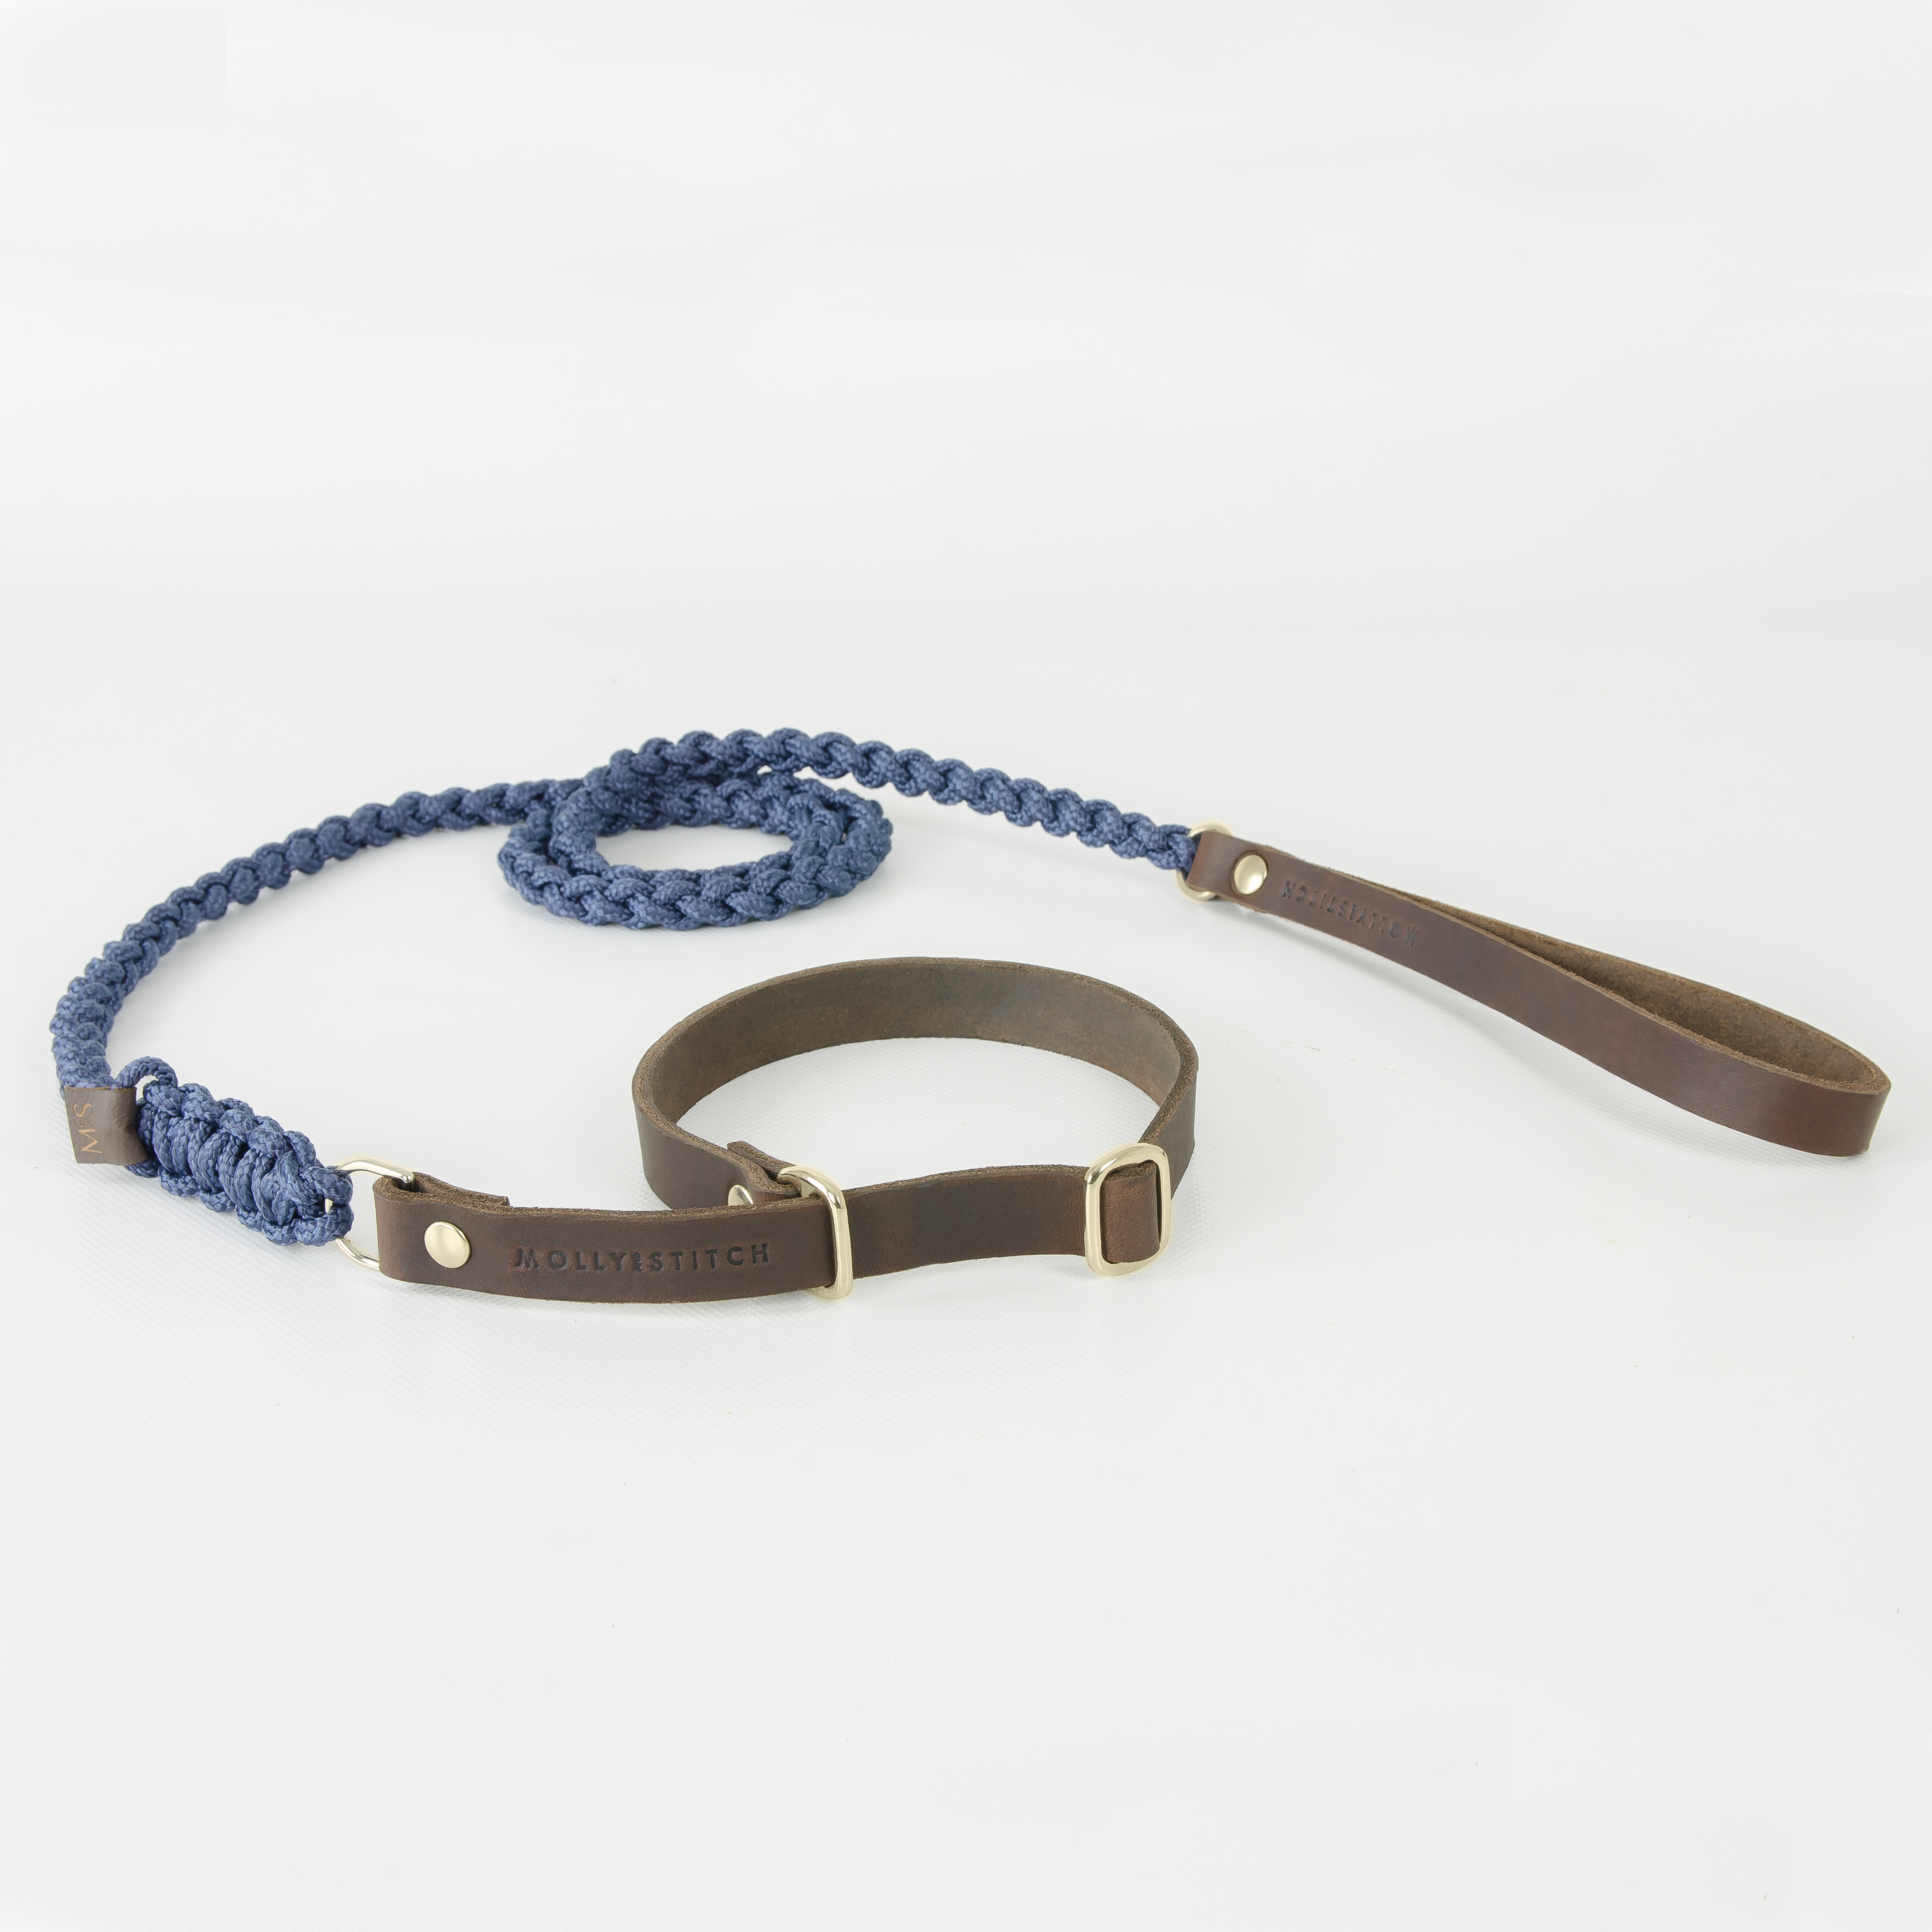 Hundeleine Retriever gold navy Touch of Leather